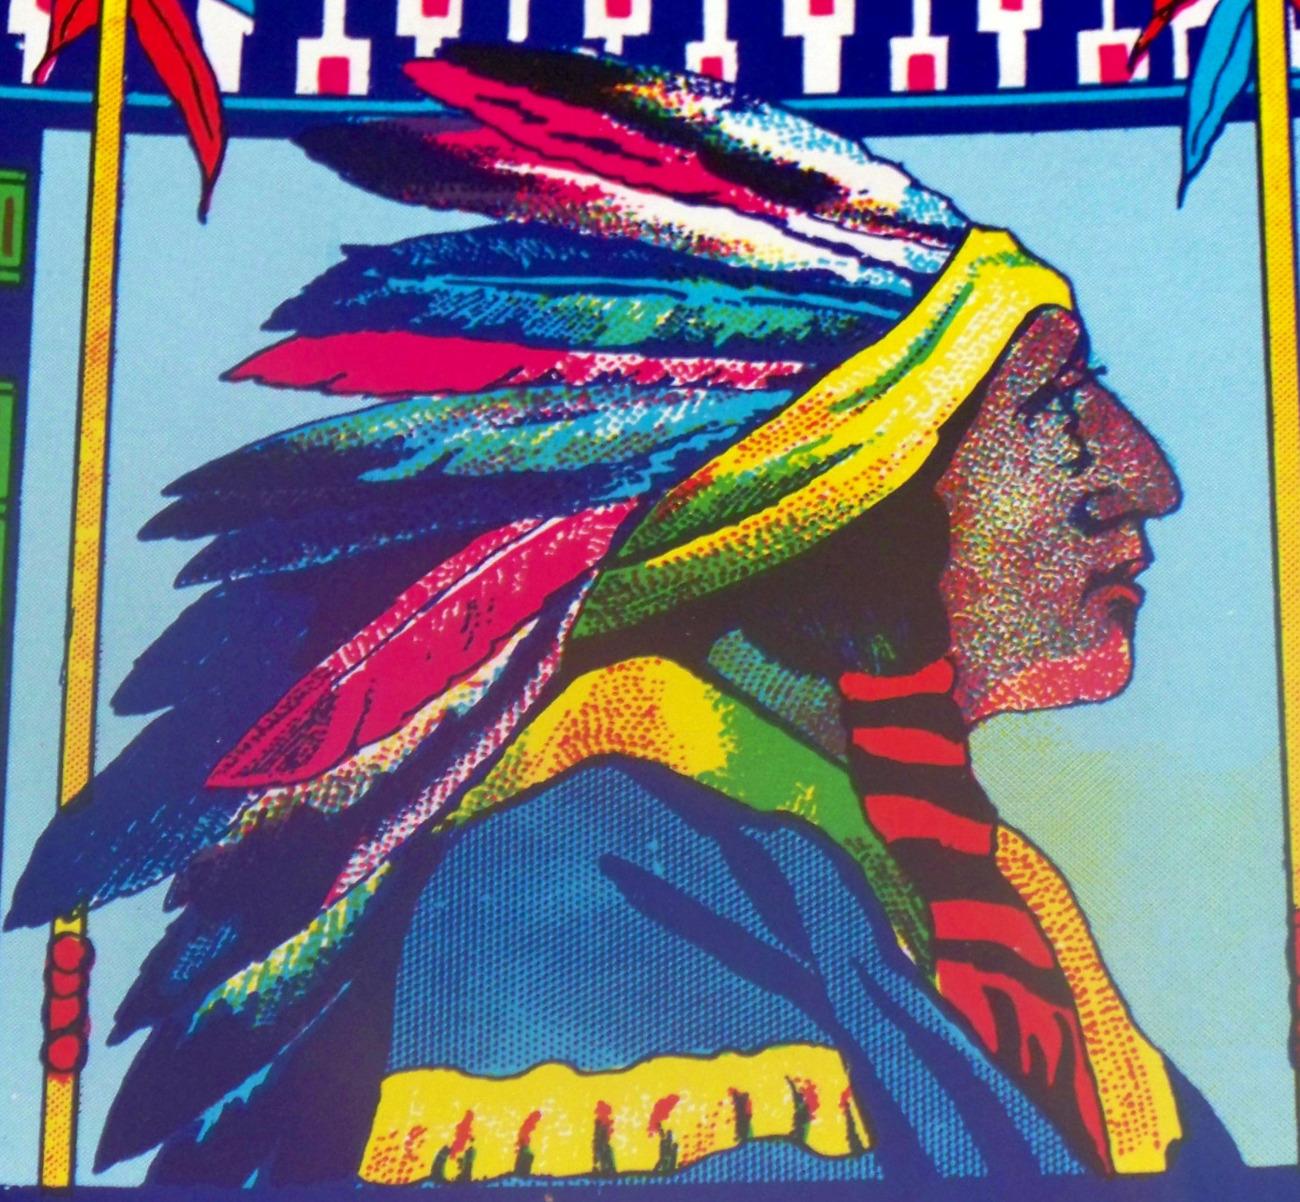 Indian chief broom label 002